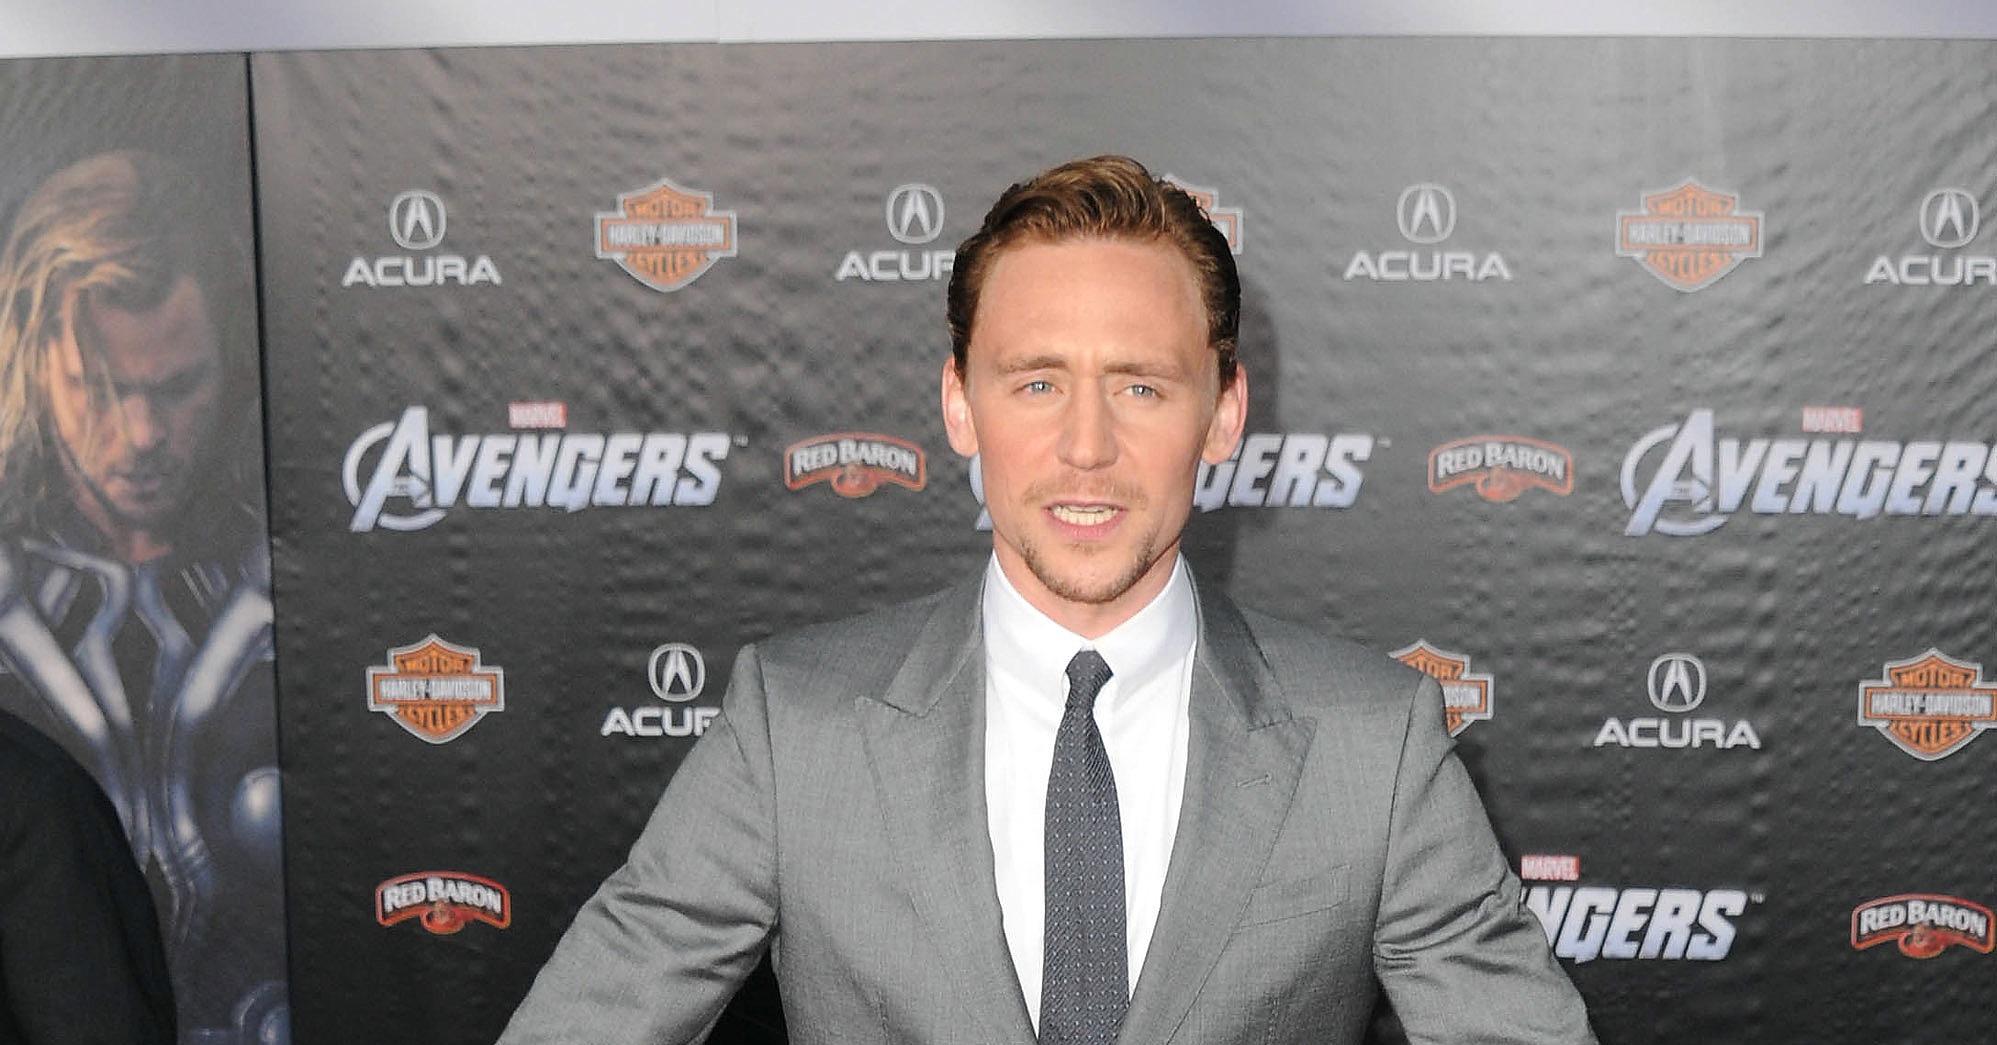 Tom-Hiddleston-did-his-best-Hulk-impression.jpg